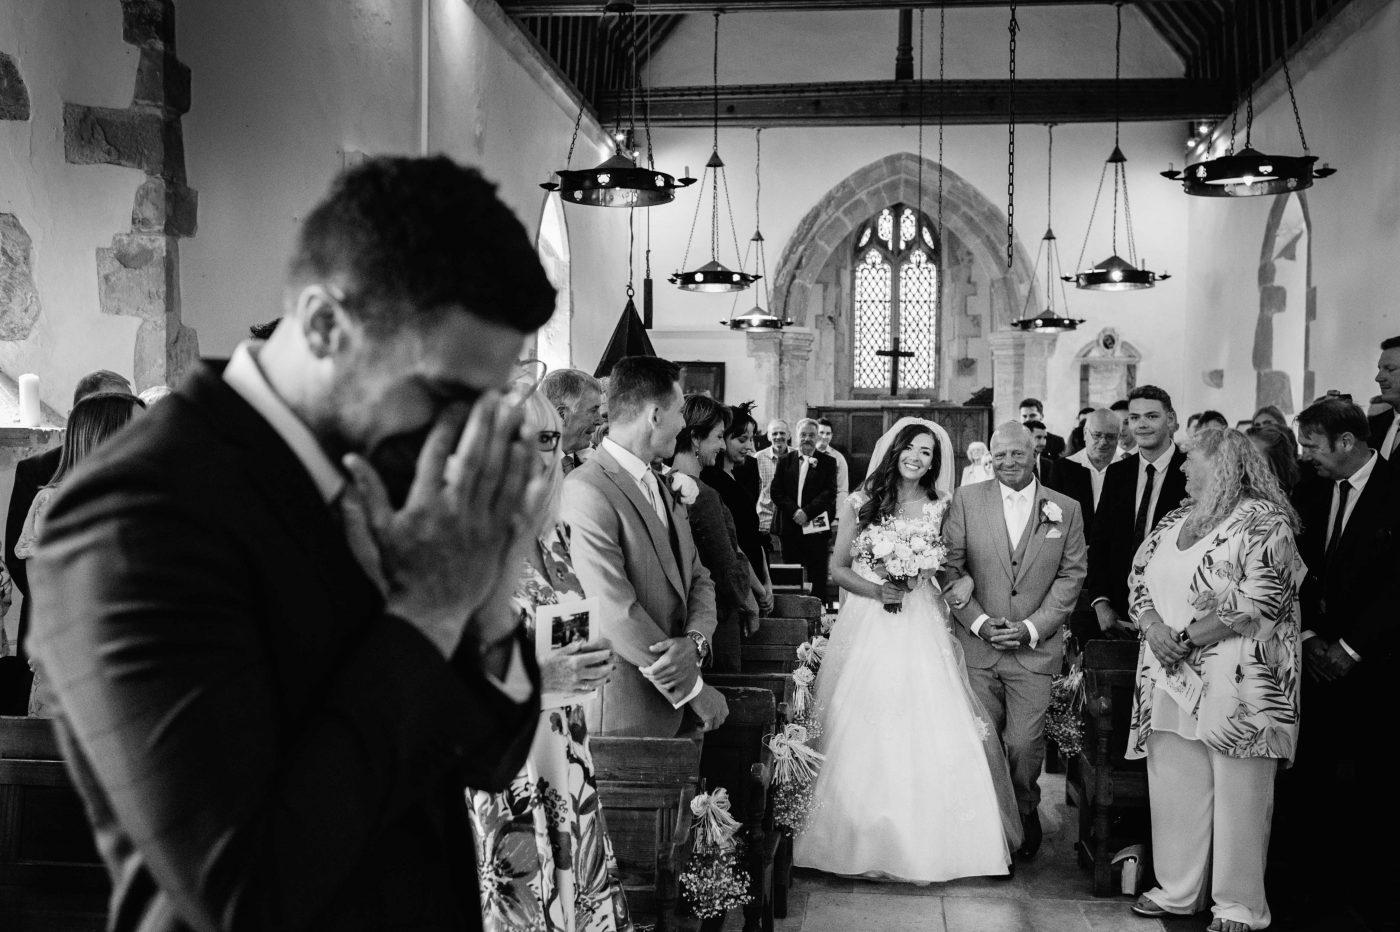 Wedding Photography by Matthew Scott Photography